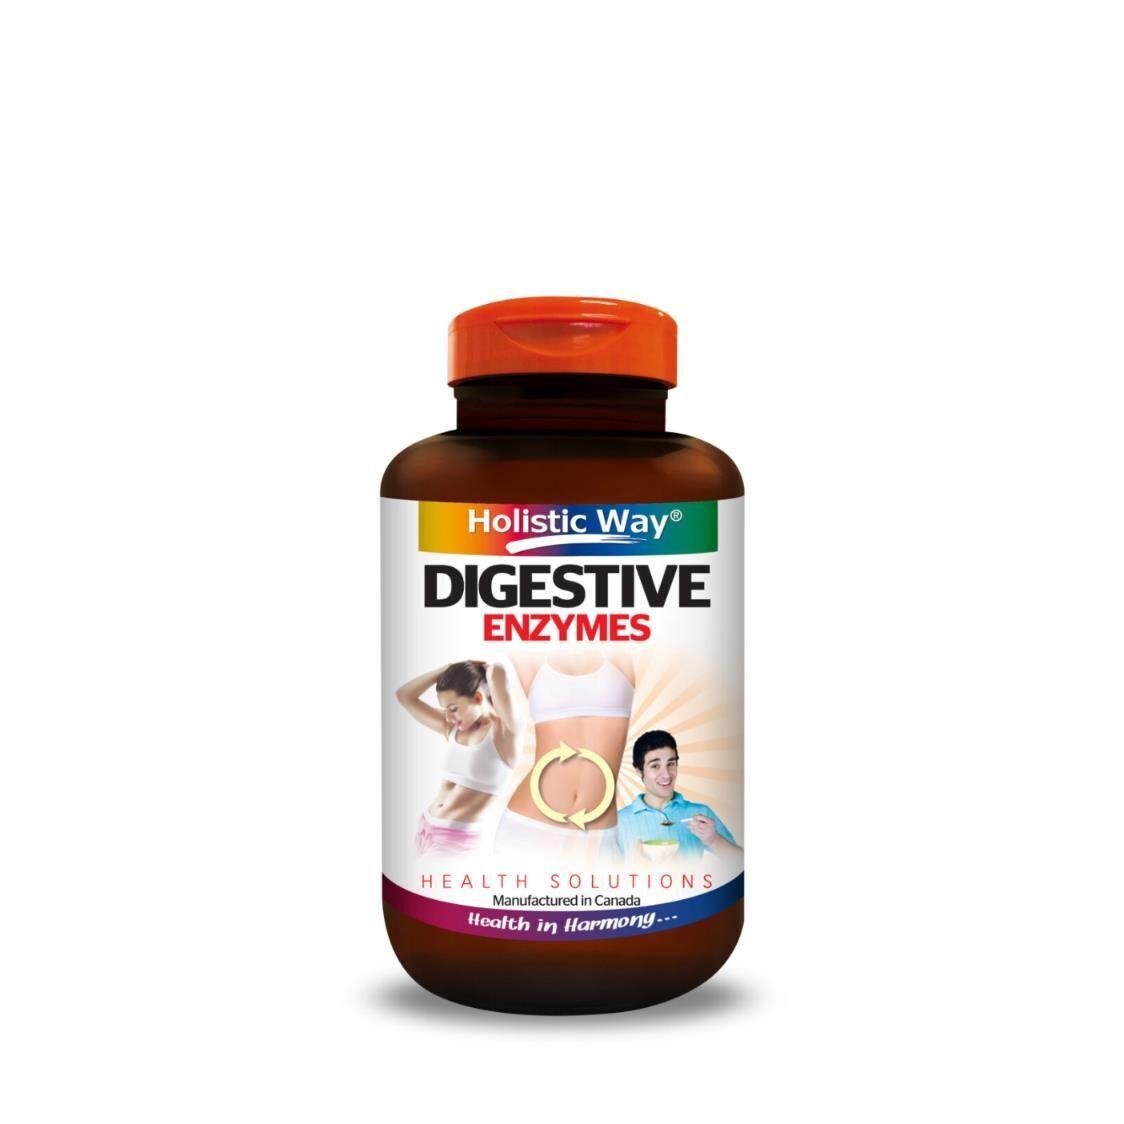 Holistic Way Digestive Enzymes 90 Vegetarian Capsules